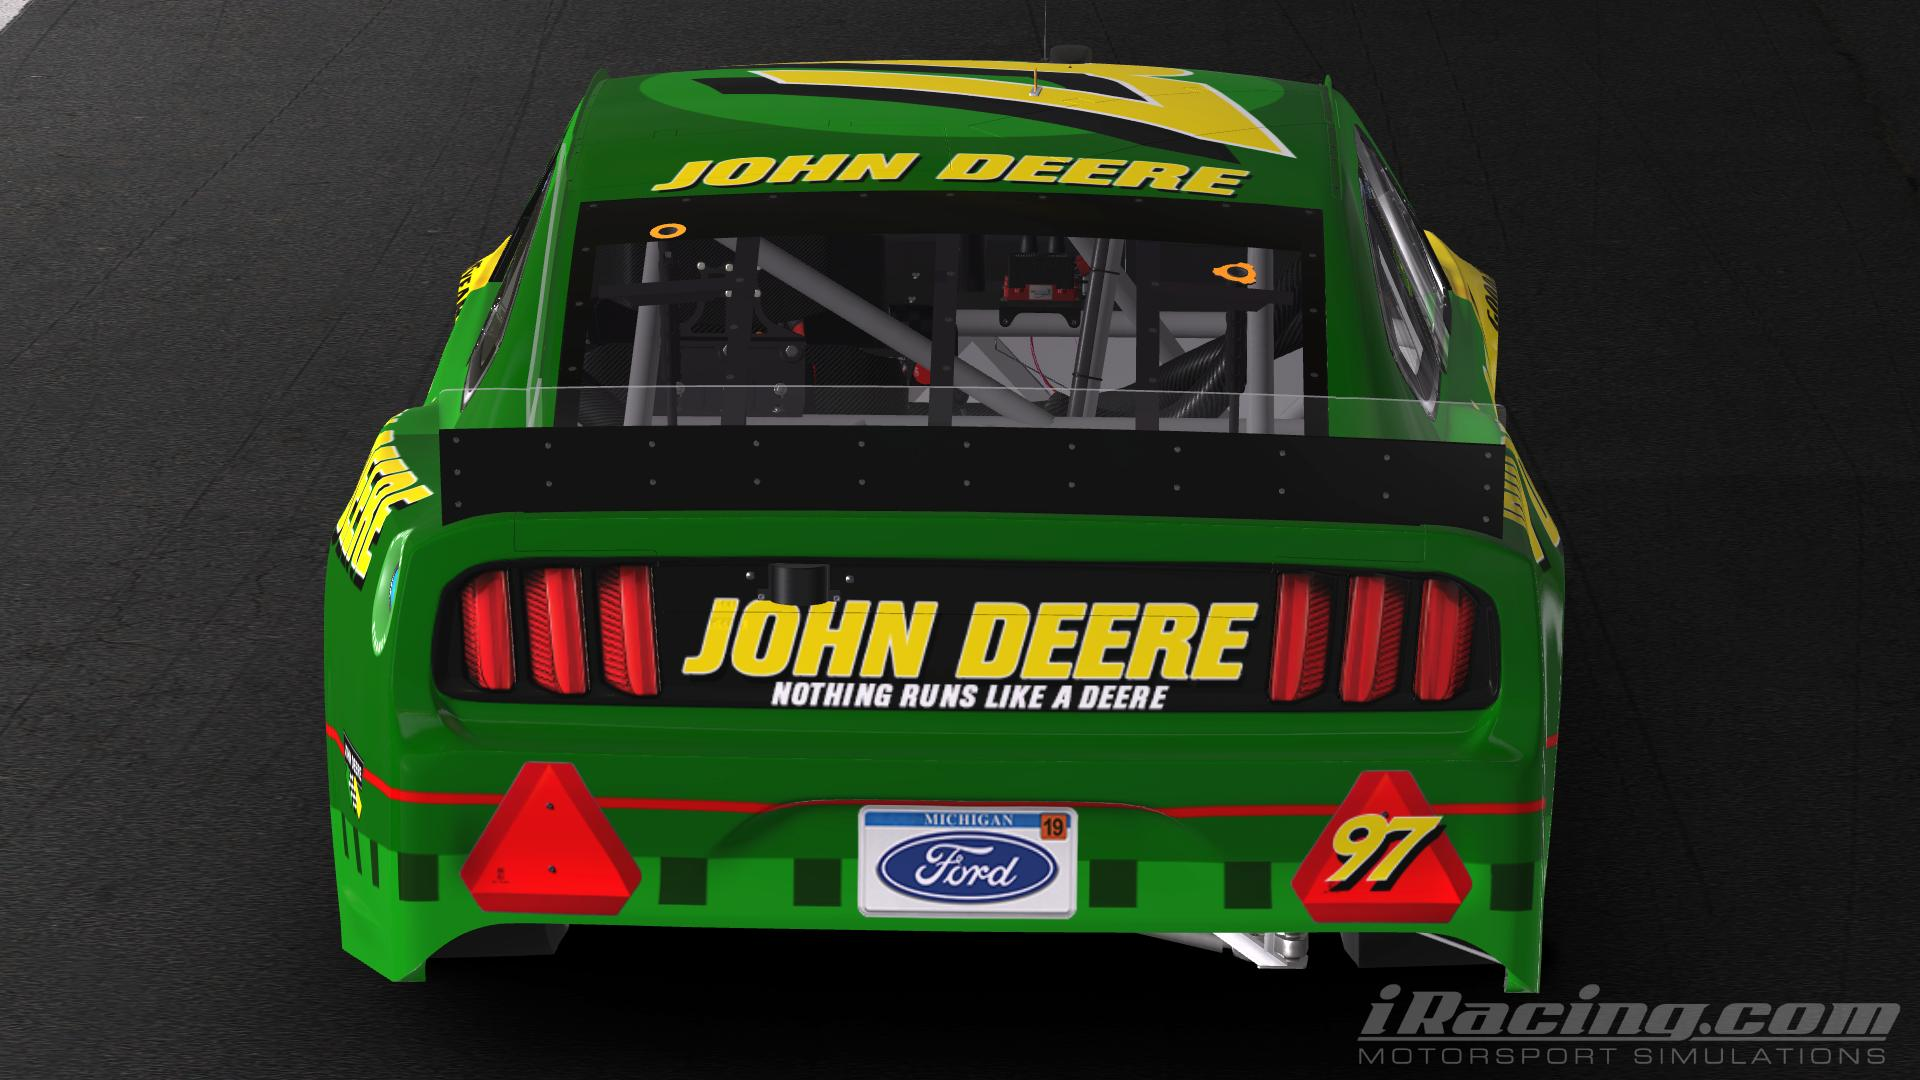 Preview of Fictional John Deere Mustang by Dustin Winegardner